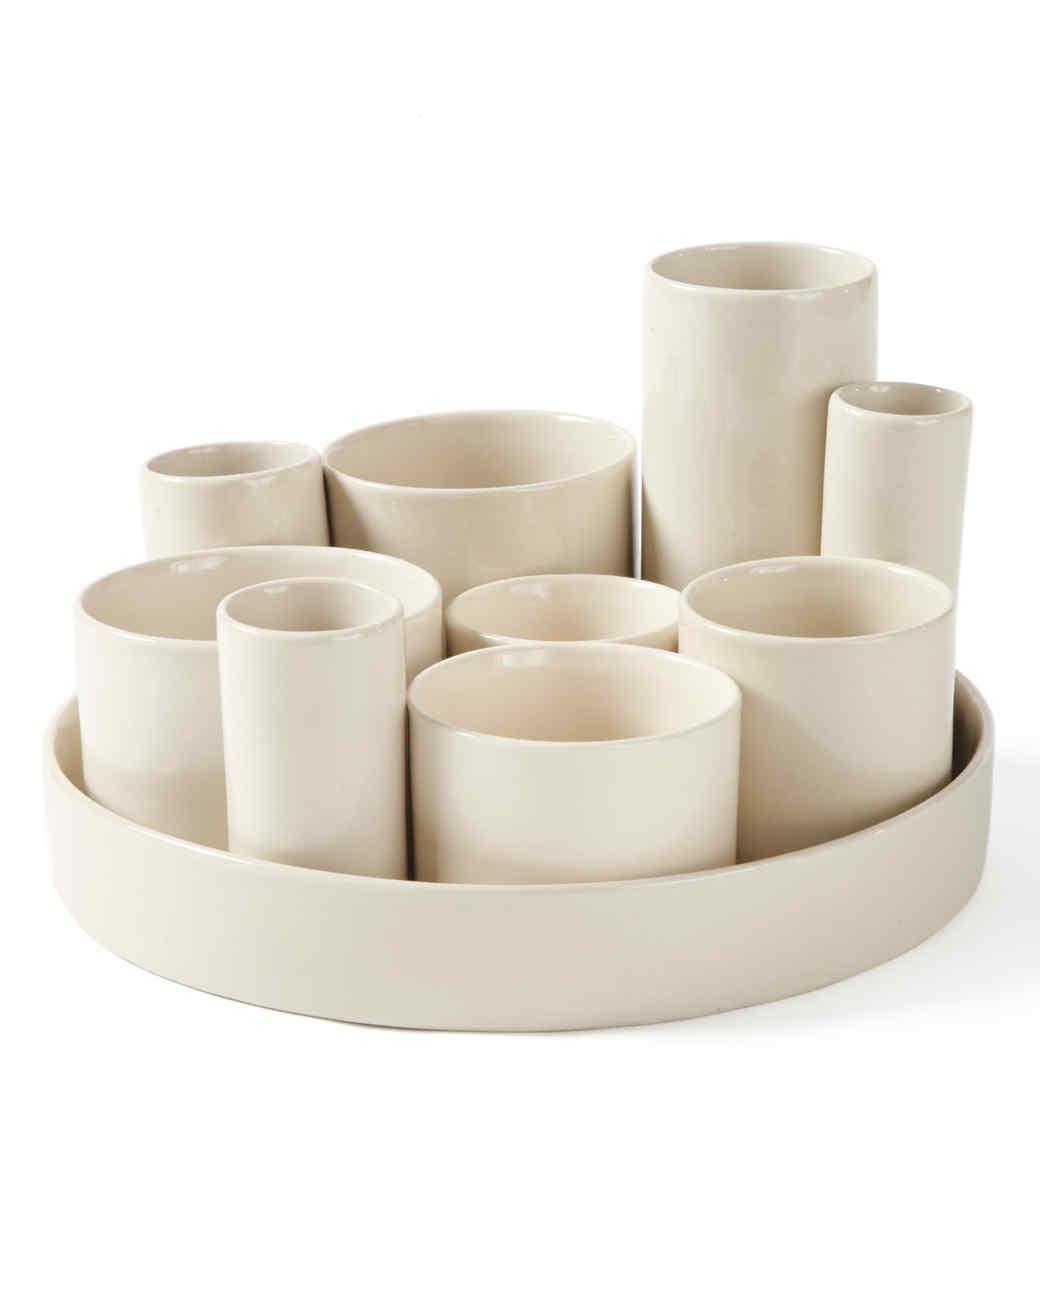 vases-mld109068.jpg